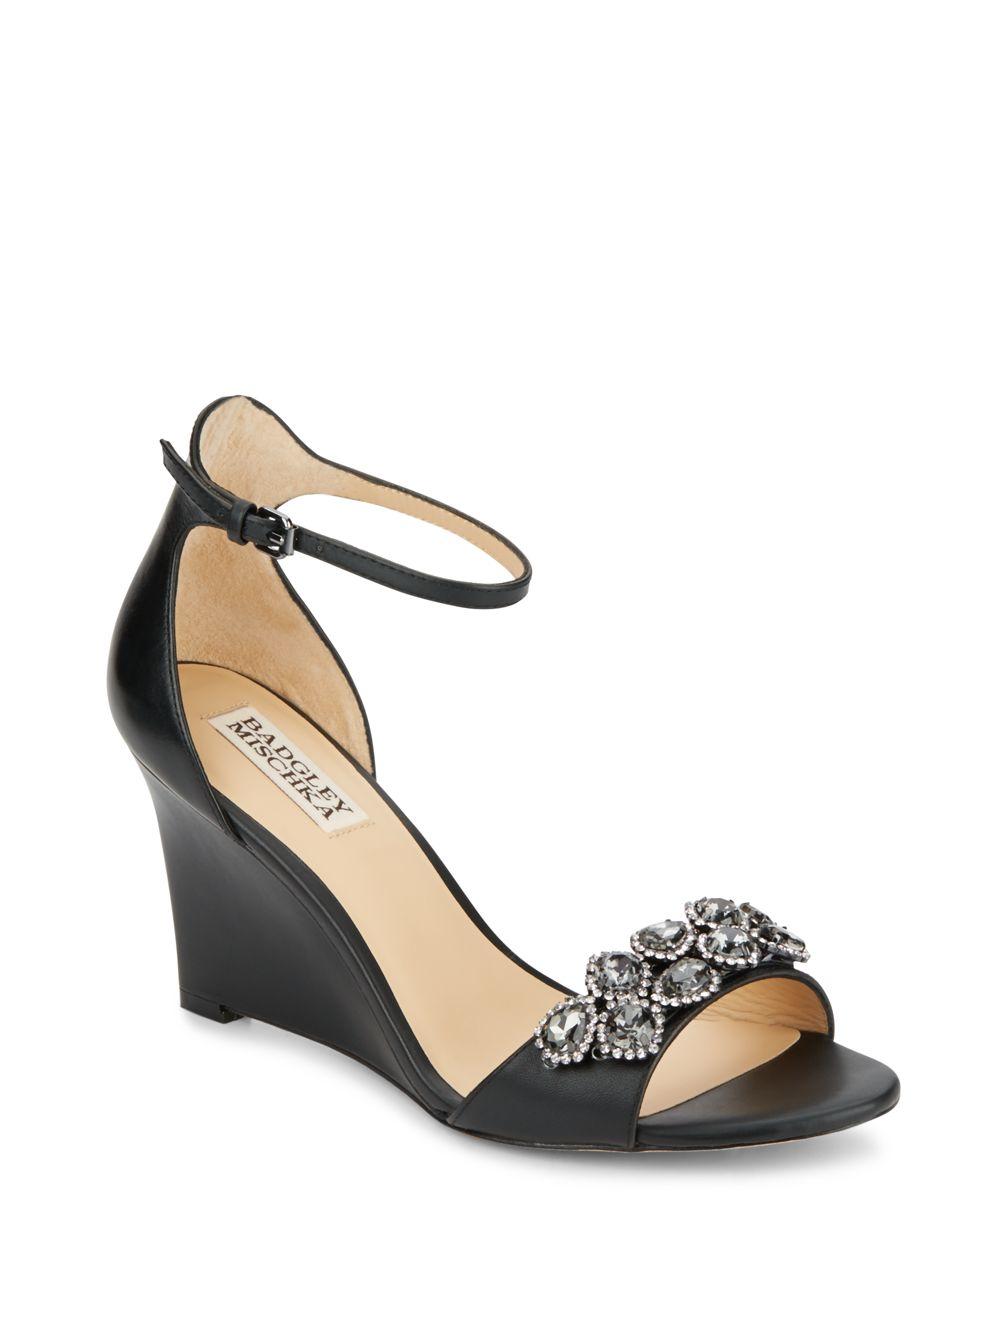 badgley mischka embellished wedge sandals in black lyst